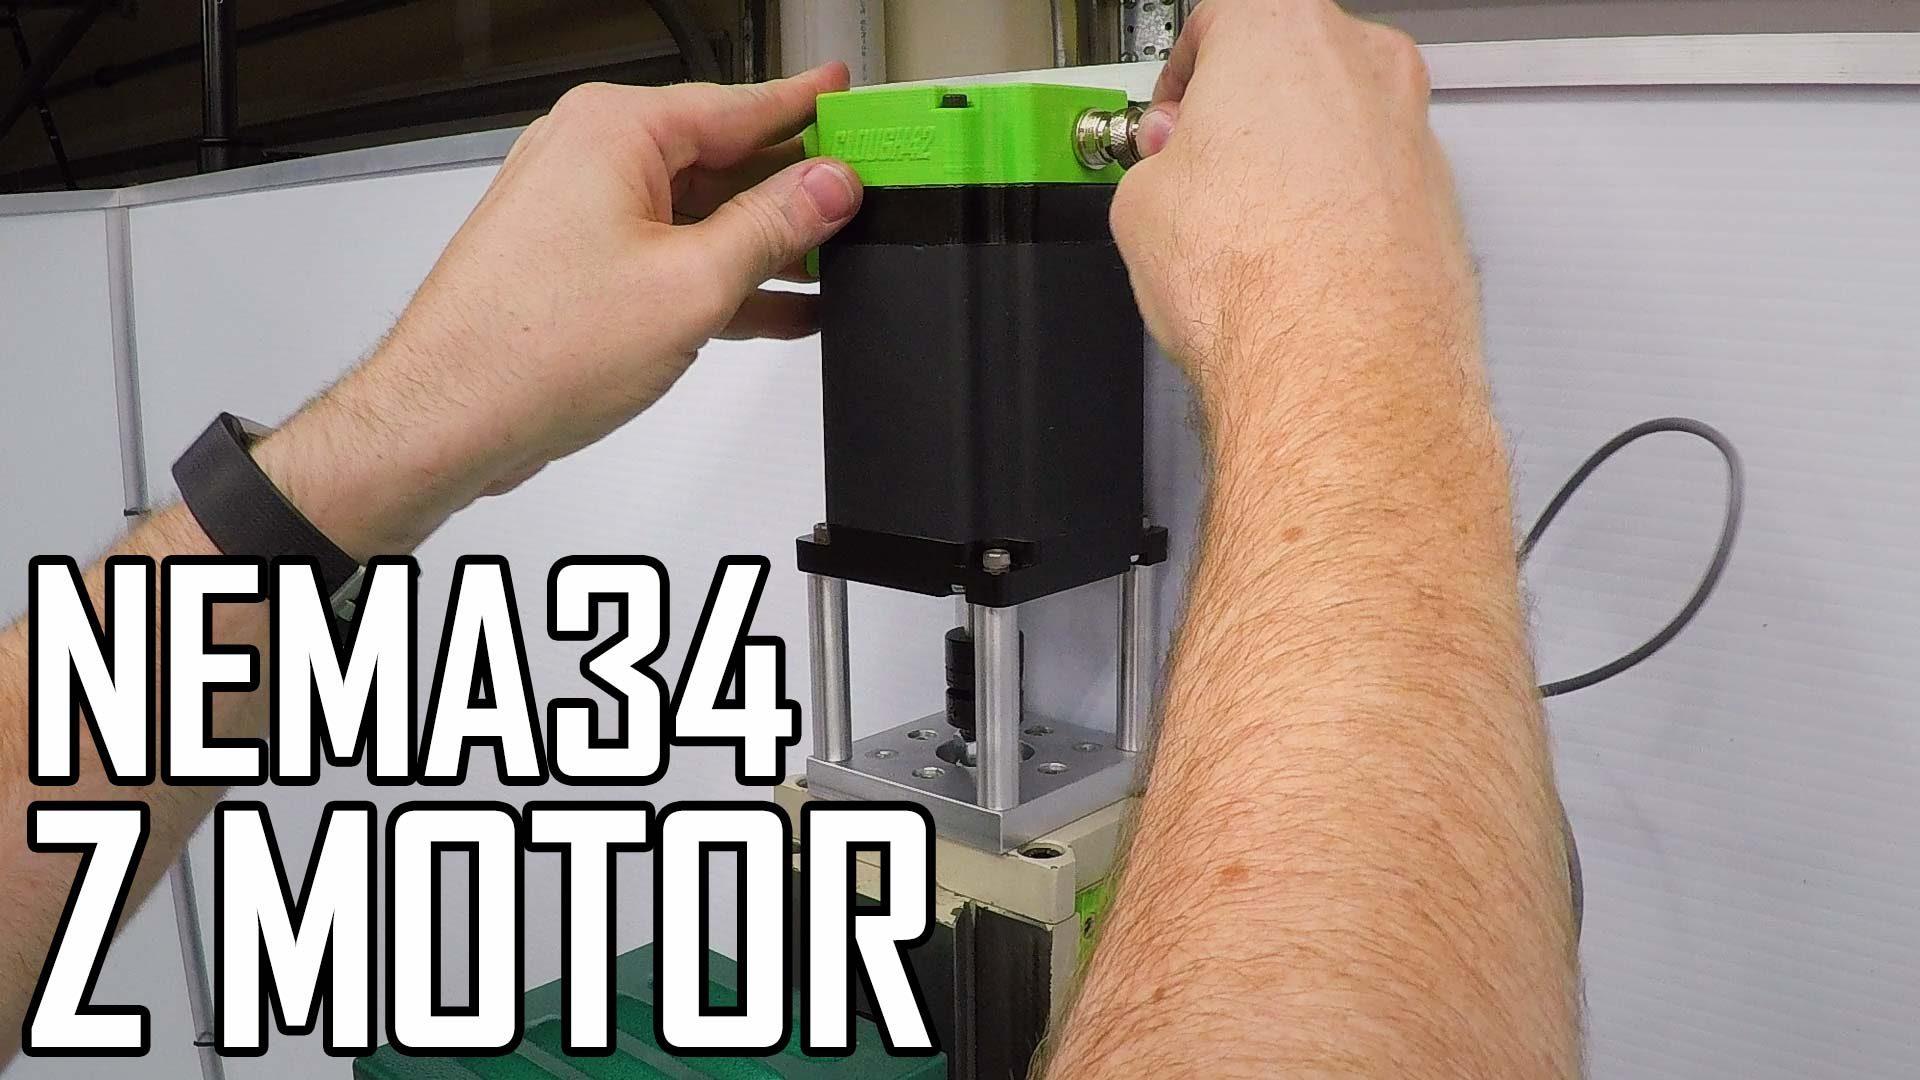 Z Motor Part 2: Installing a NEMA34 stepper motor and CNC mill tour